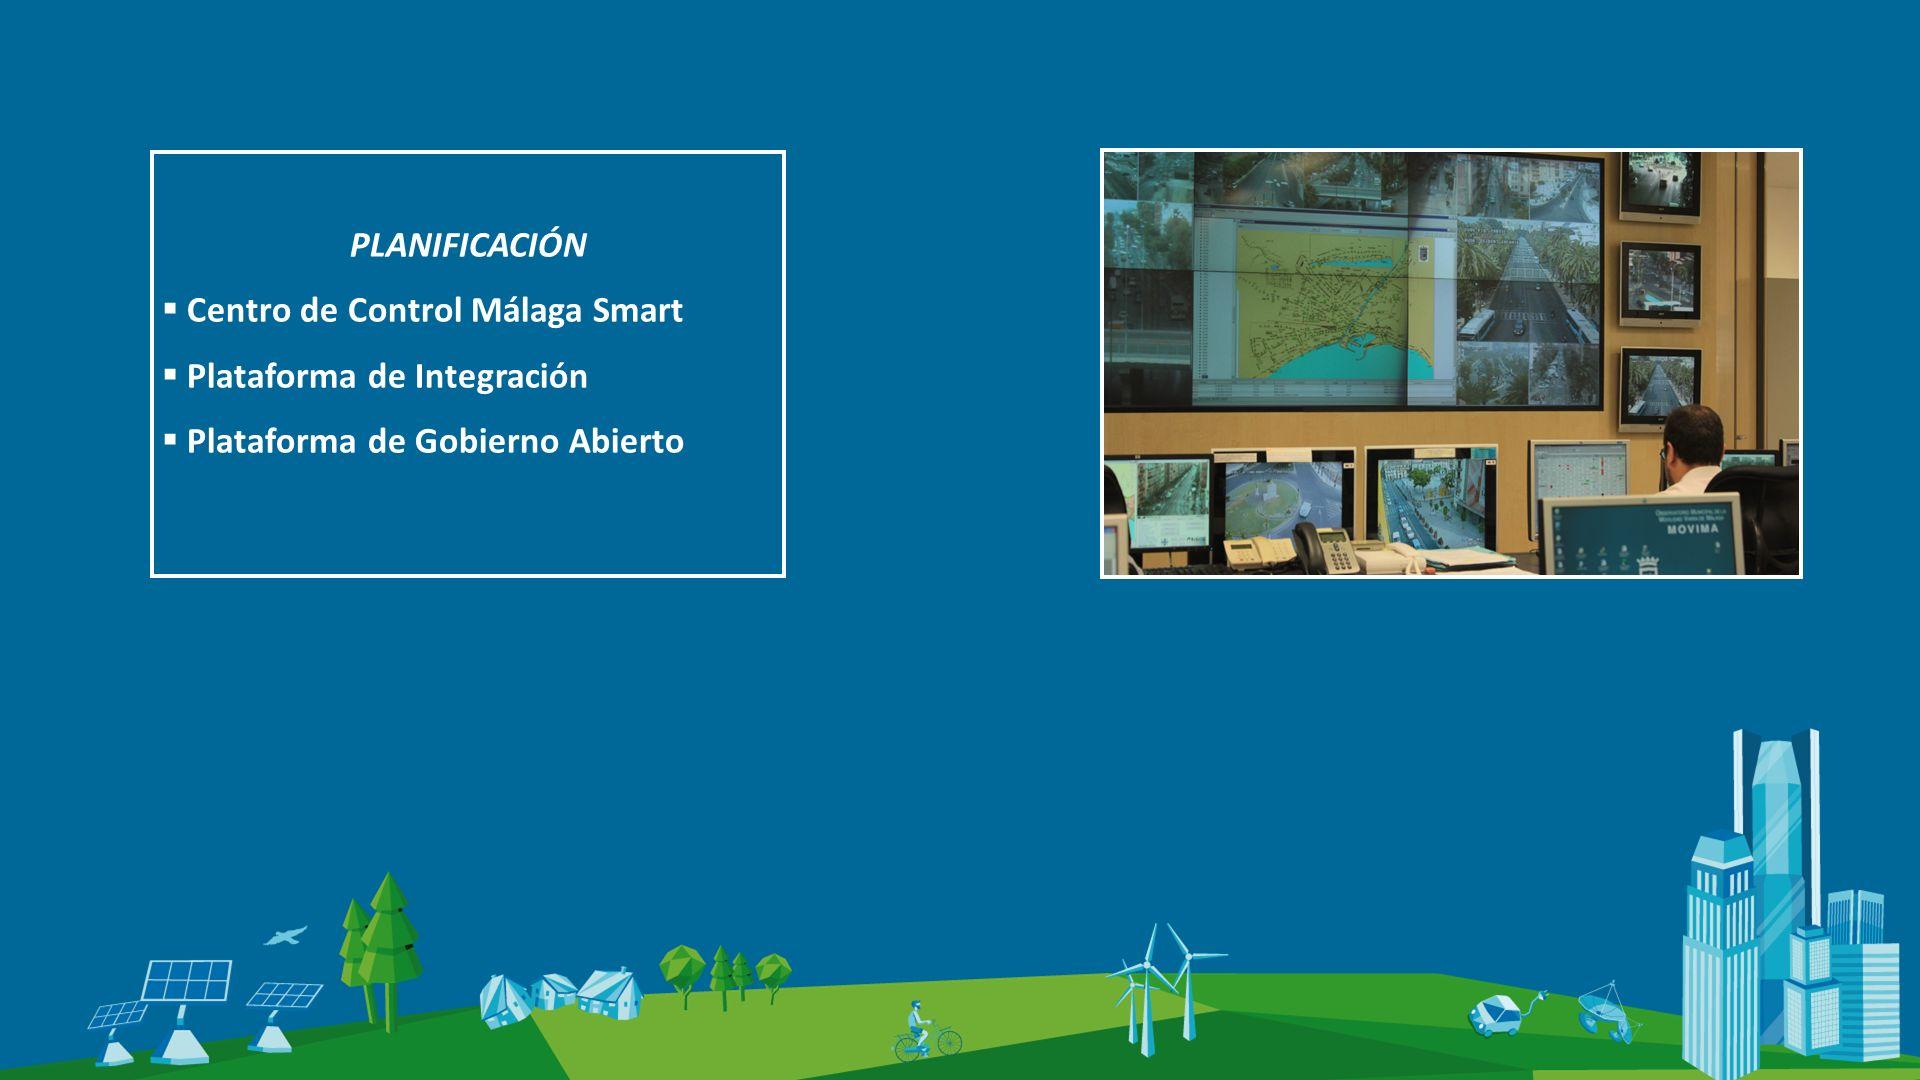 INFRAESTRUCTURA TIC Centro Municipal de proceso de datos (CPD) y comunicaciones Red de Fibra Óptica Red de telefonía municipal de VoIP Red inalámbrica corporativa Red WiFi municipal